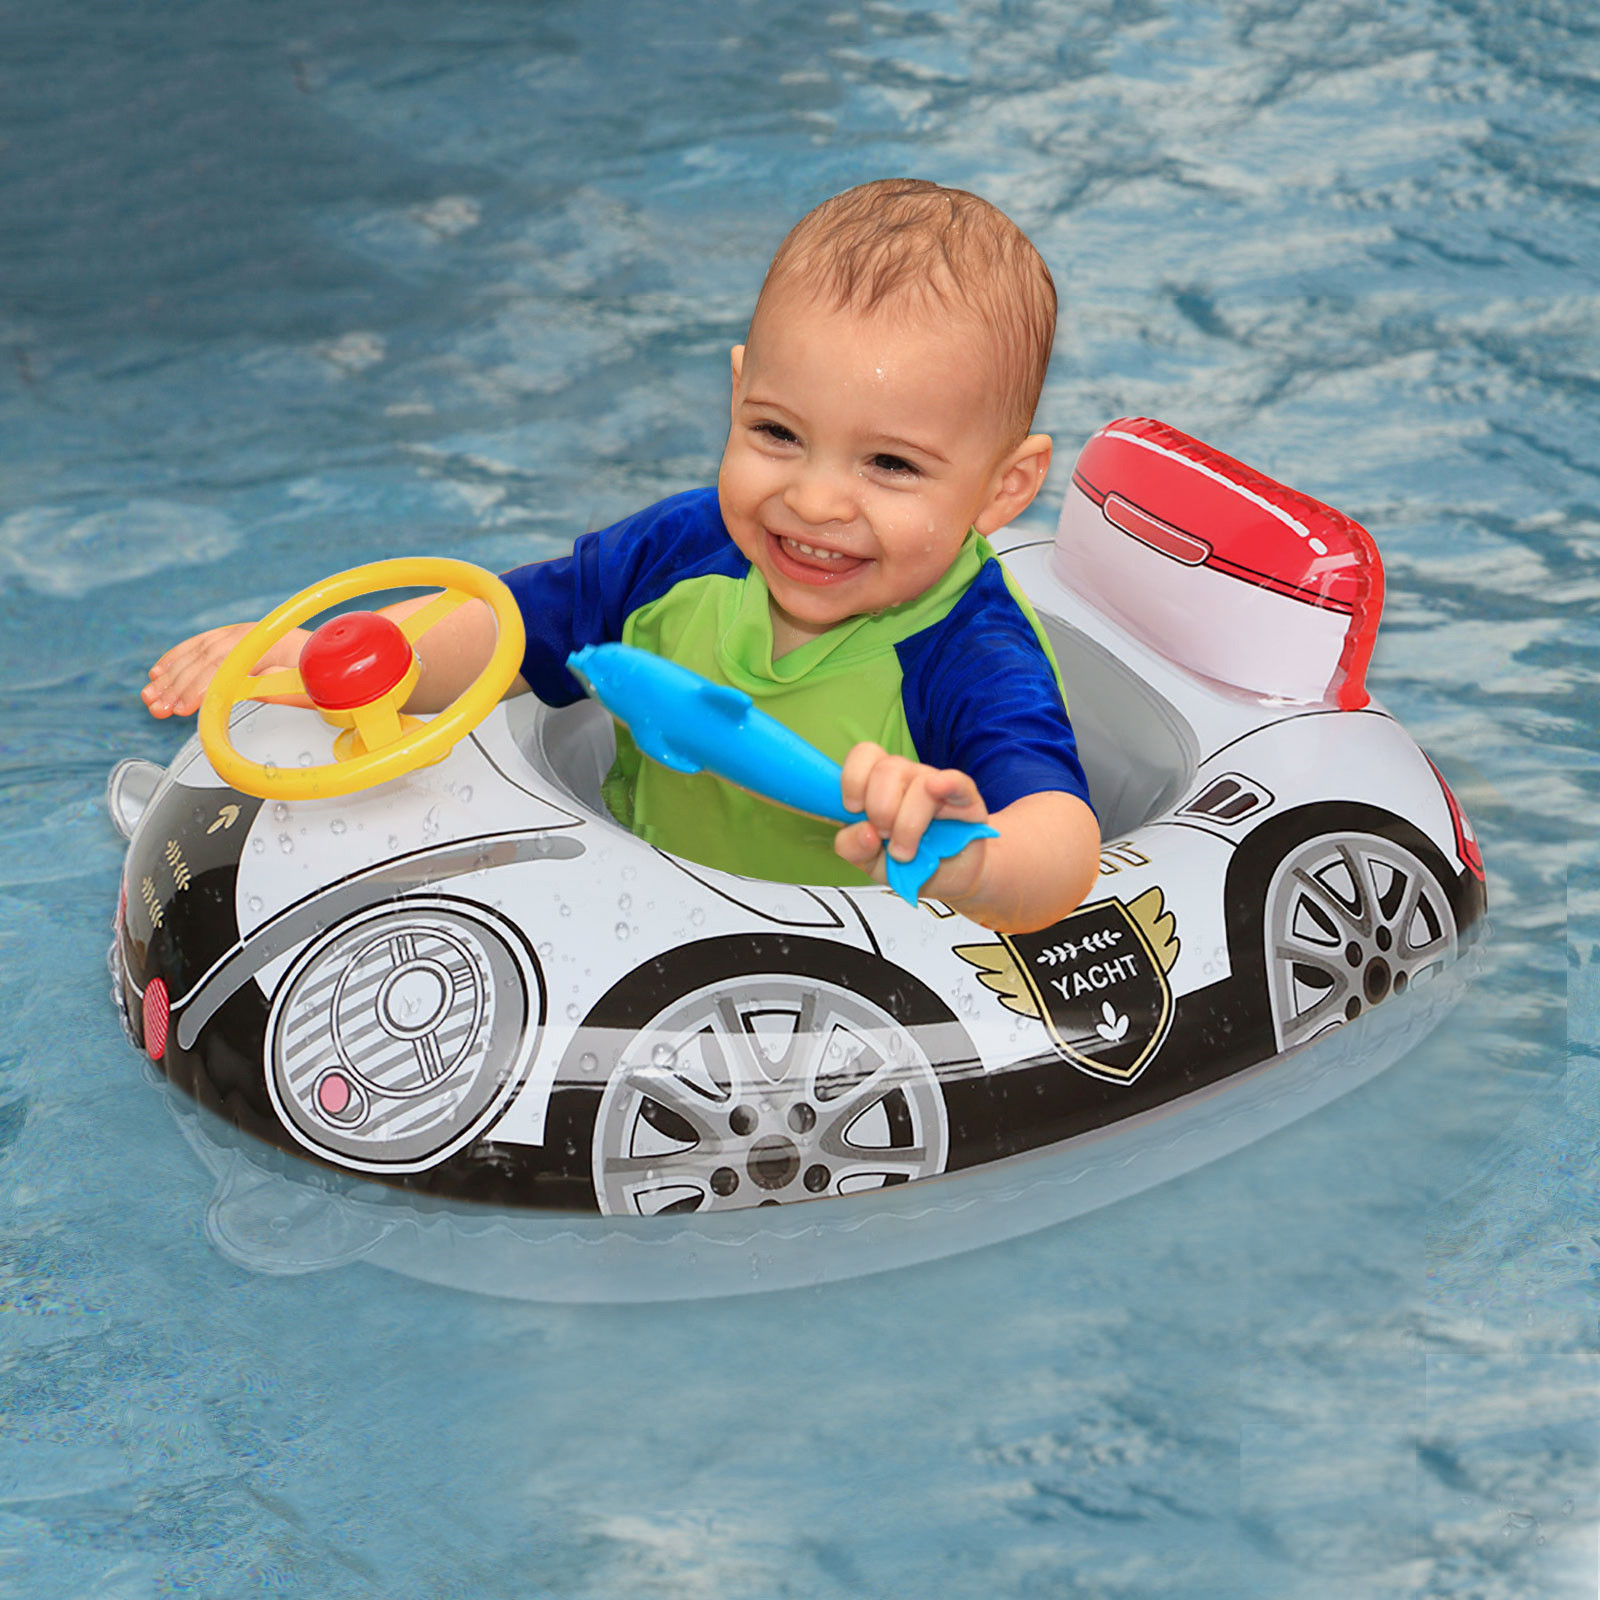 Cartoon Car Swimming Ring for Kids PVC Inflatable Swimming Ring Summer Outdoor Swimming Pool Floats Kids Swimming Toys 70x55cm